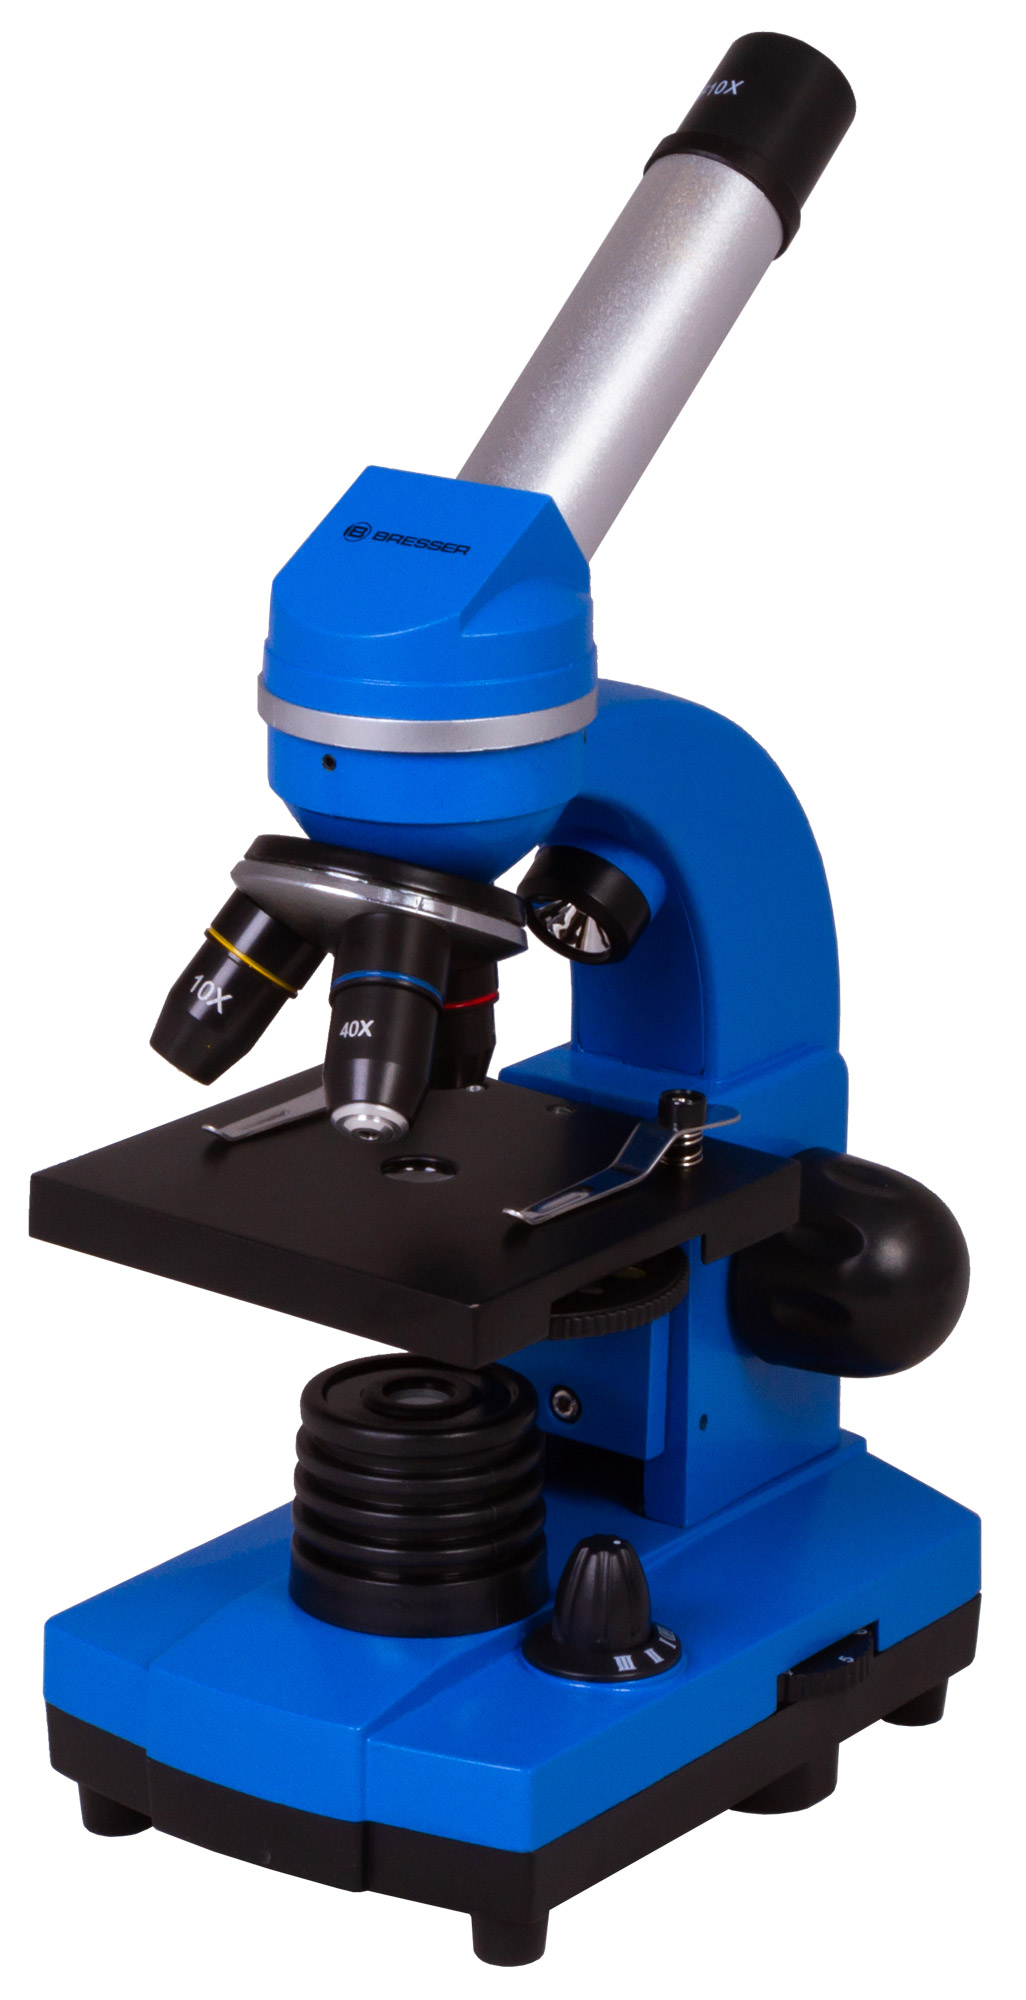 Микроскоп Bresser (Брессер) Junior Biolux SEL 40–1600x, синий фото